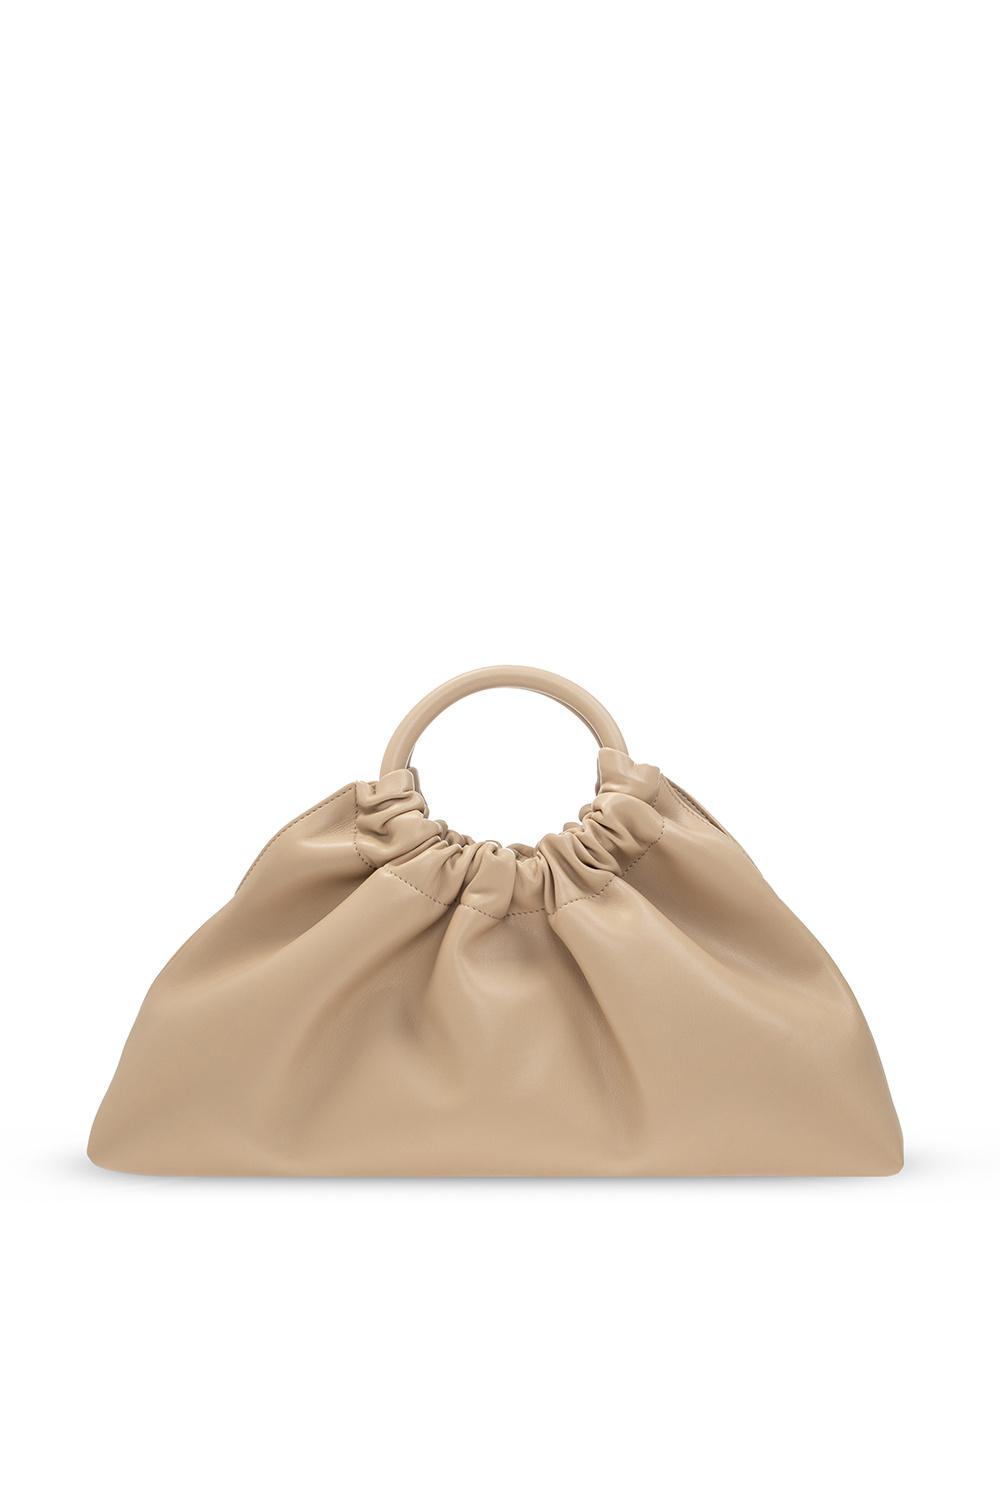 Nanushka 'Trapeze' hand bag